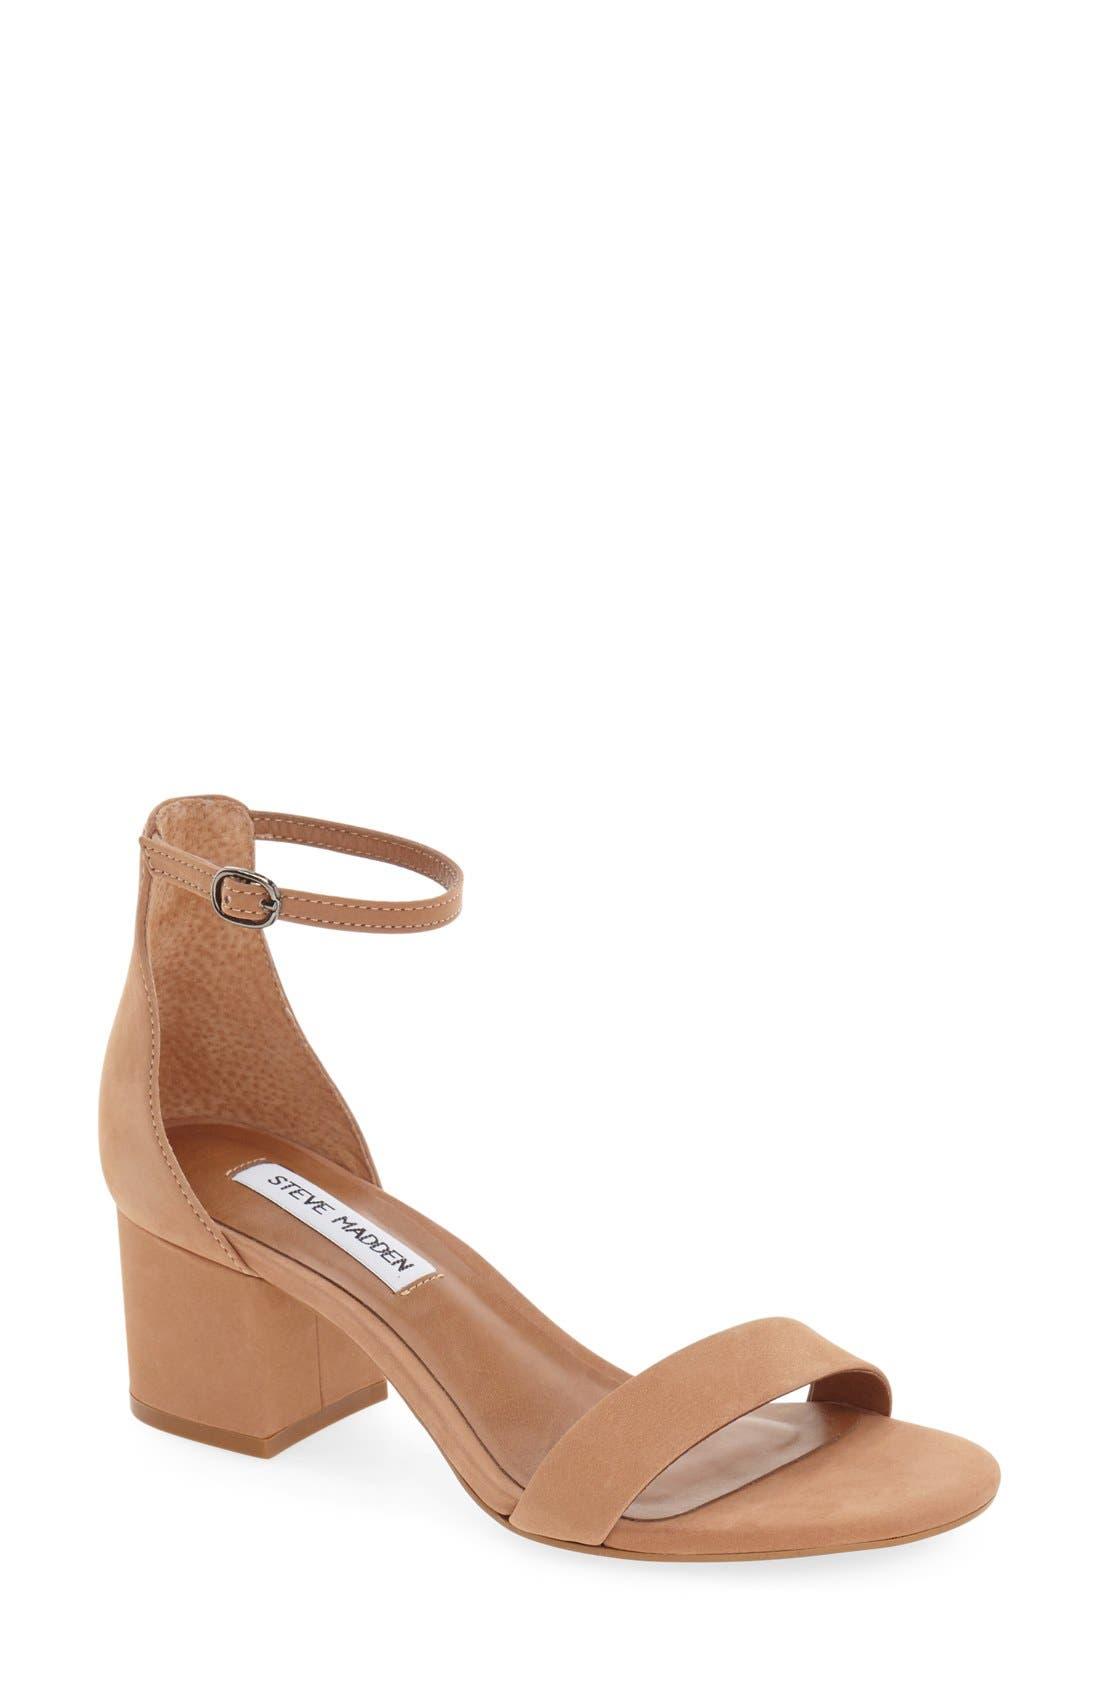 Irenee Ankle Strap Sandal,                             Main thumbnail 1, color,                             Tan Nubuck